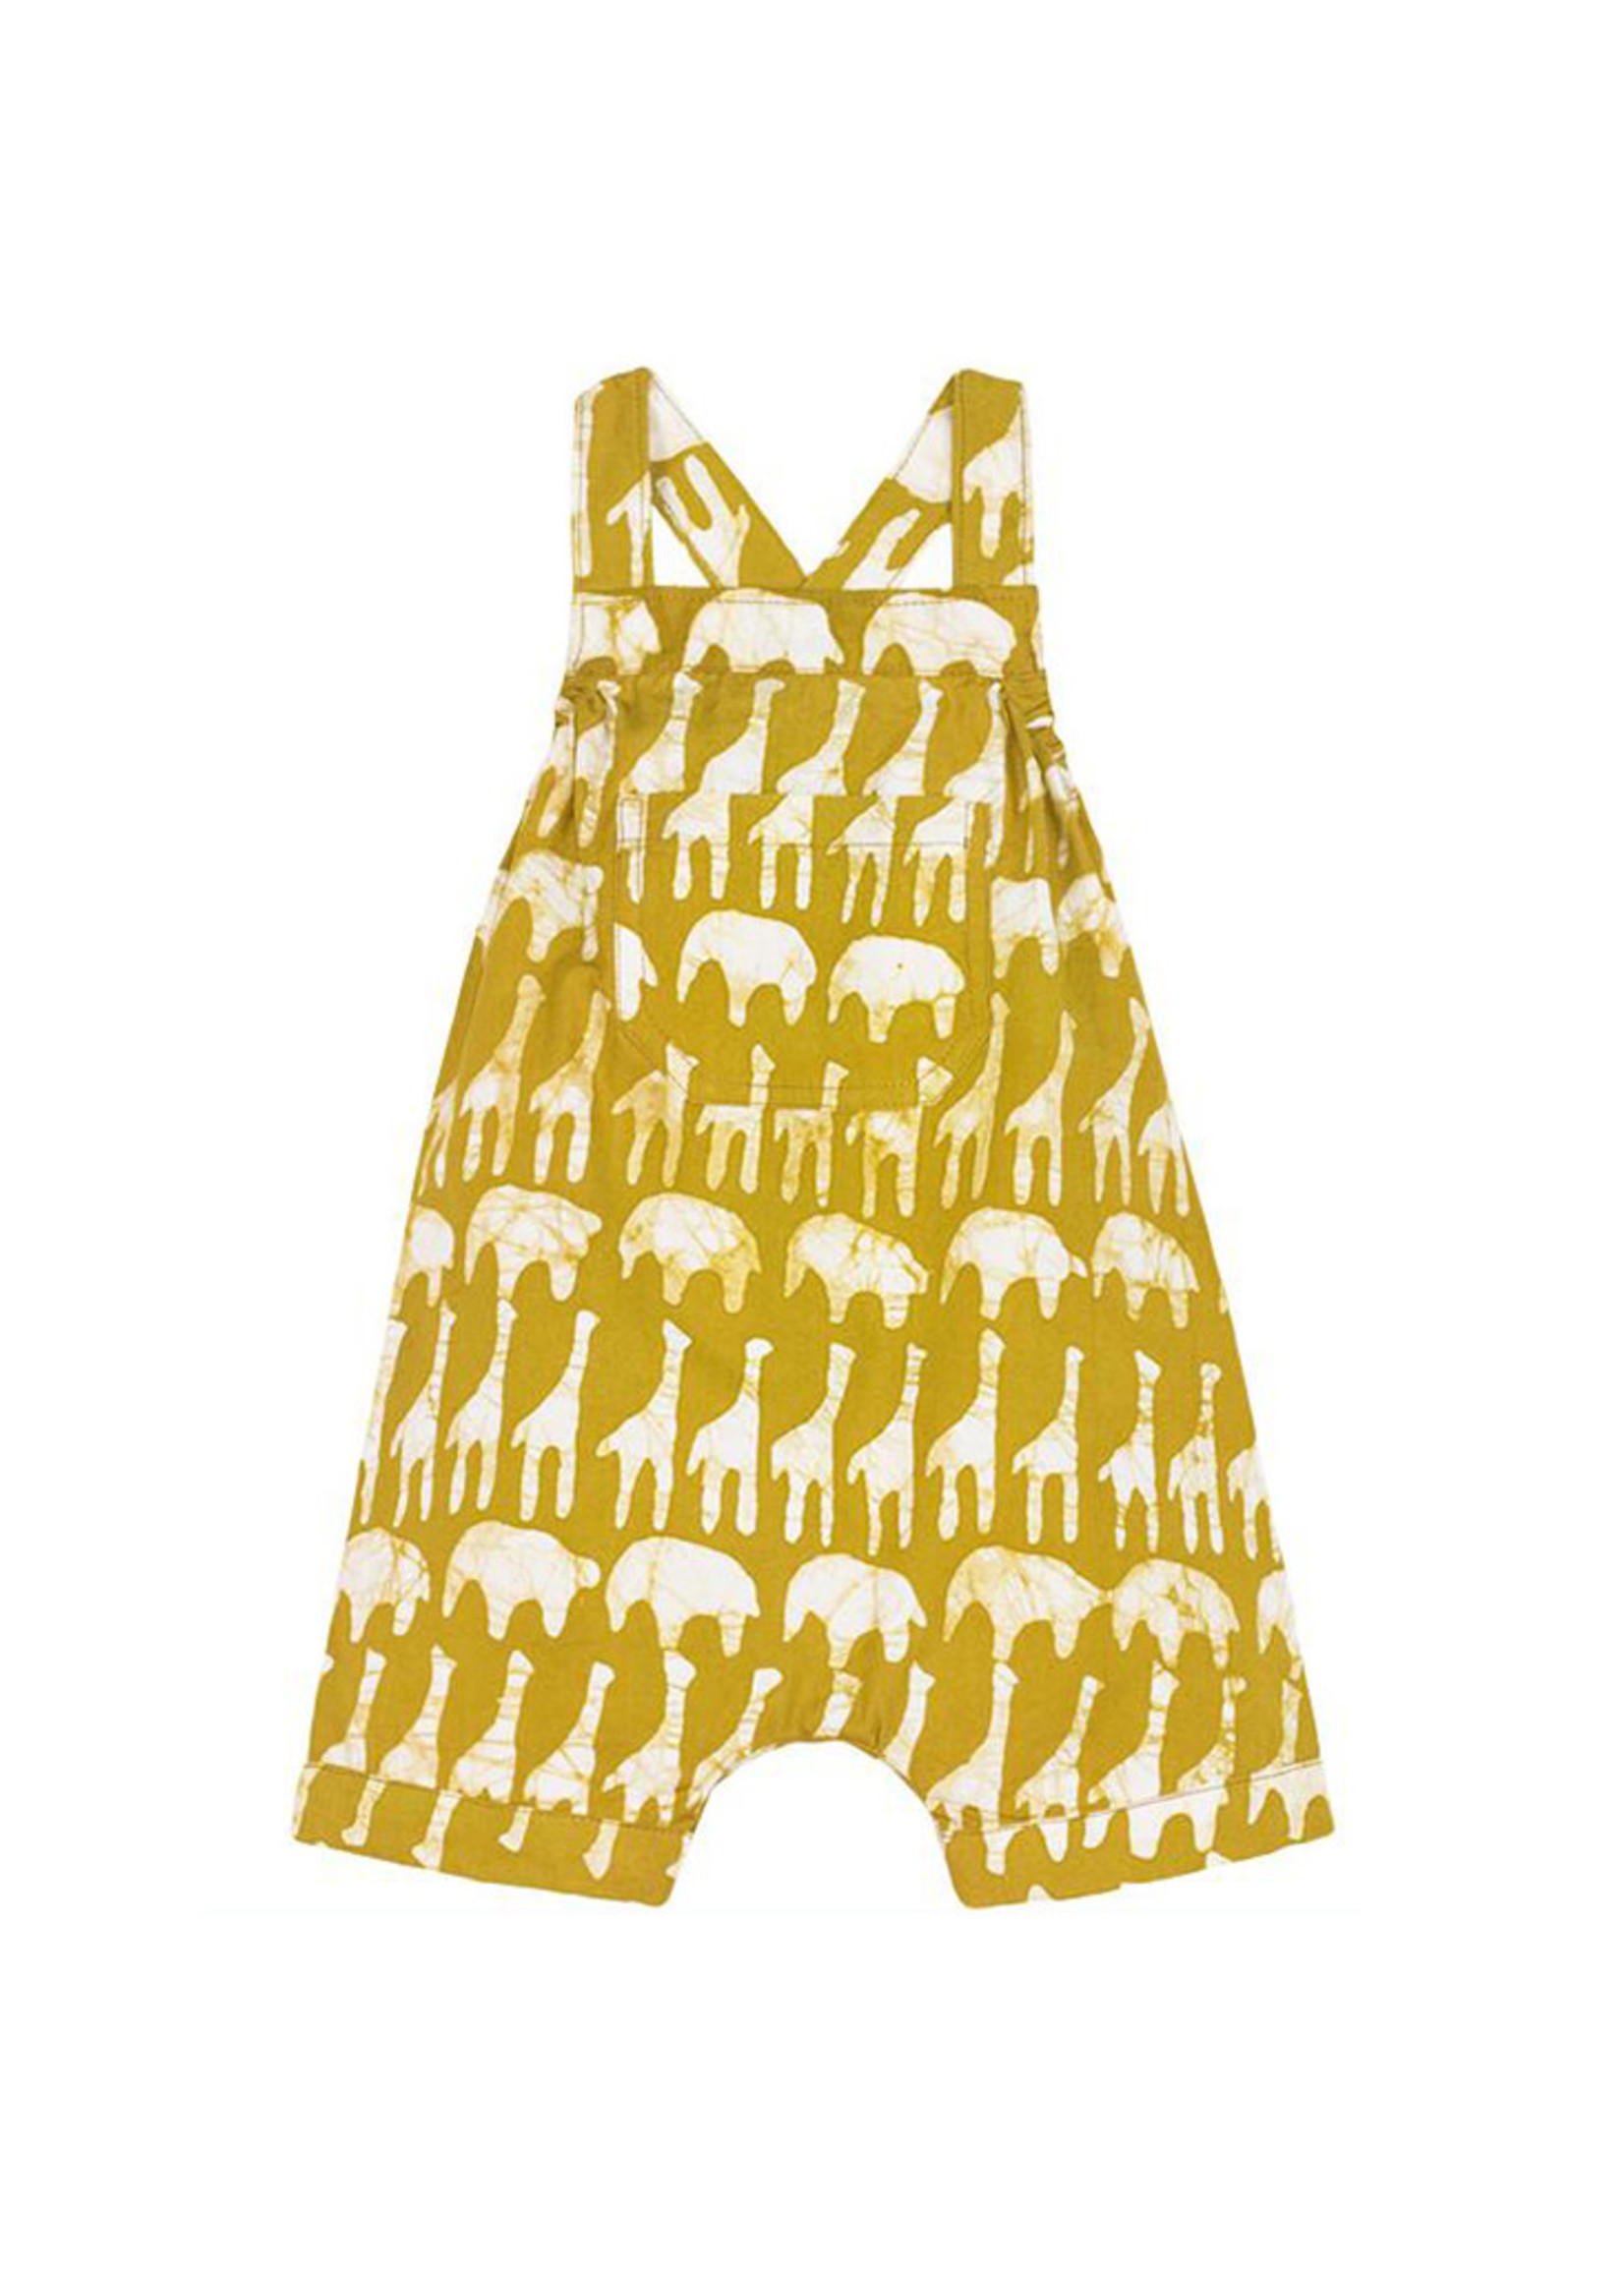 Global Mamas Sahara Mustard Baby Romper